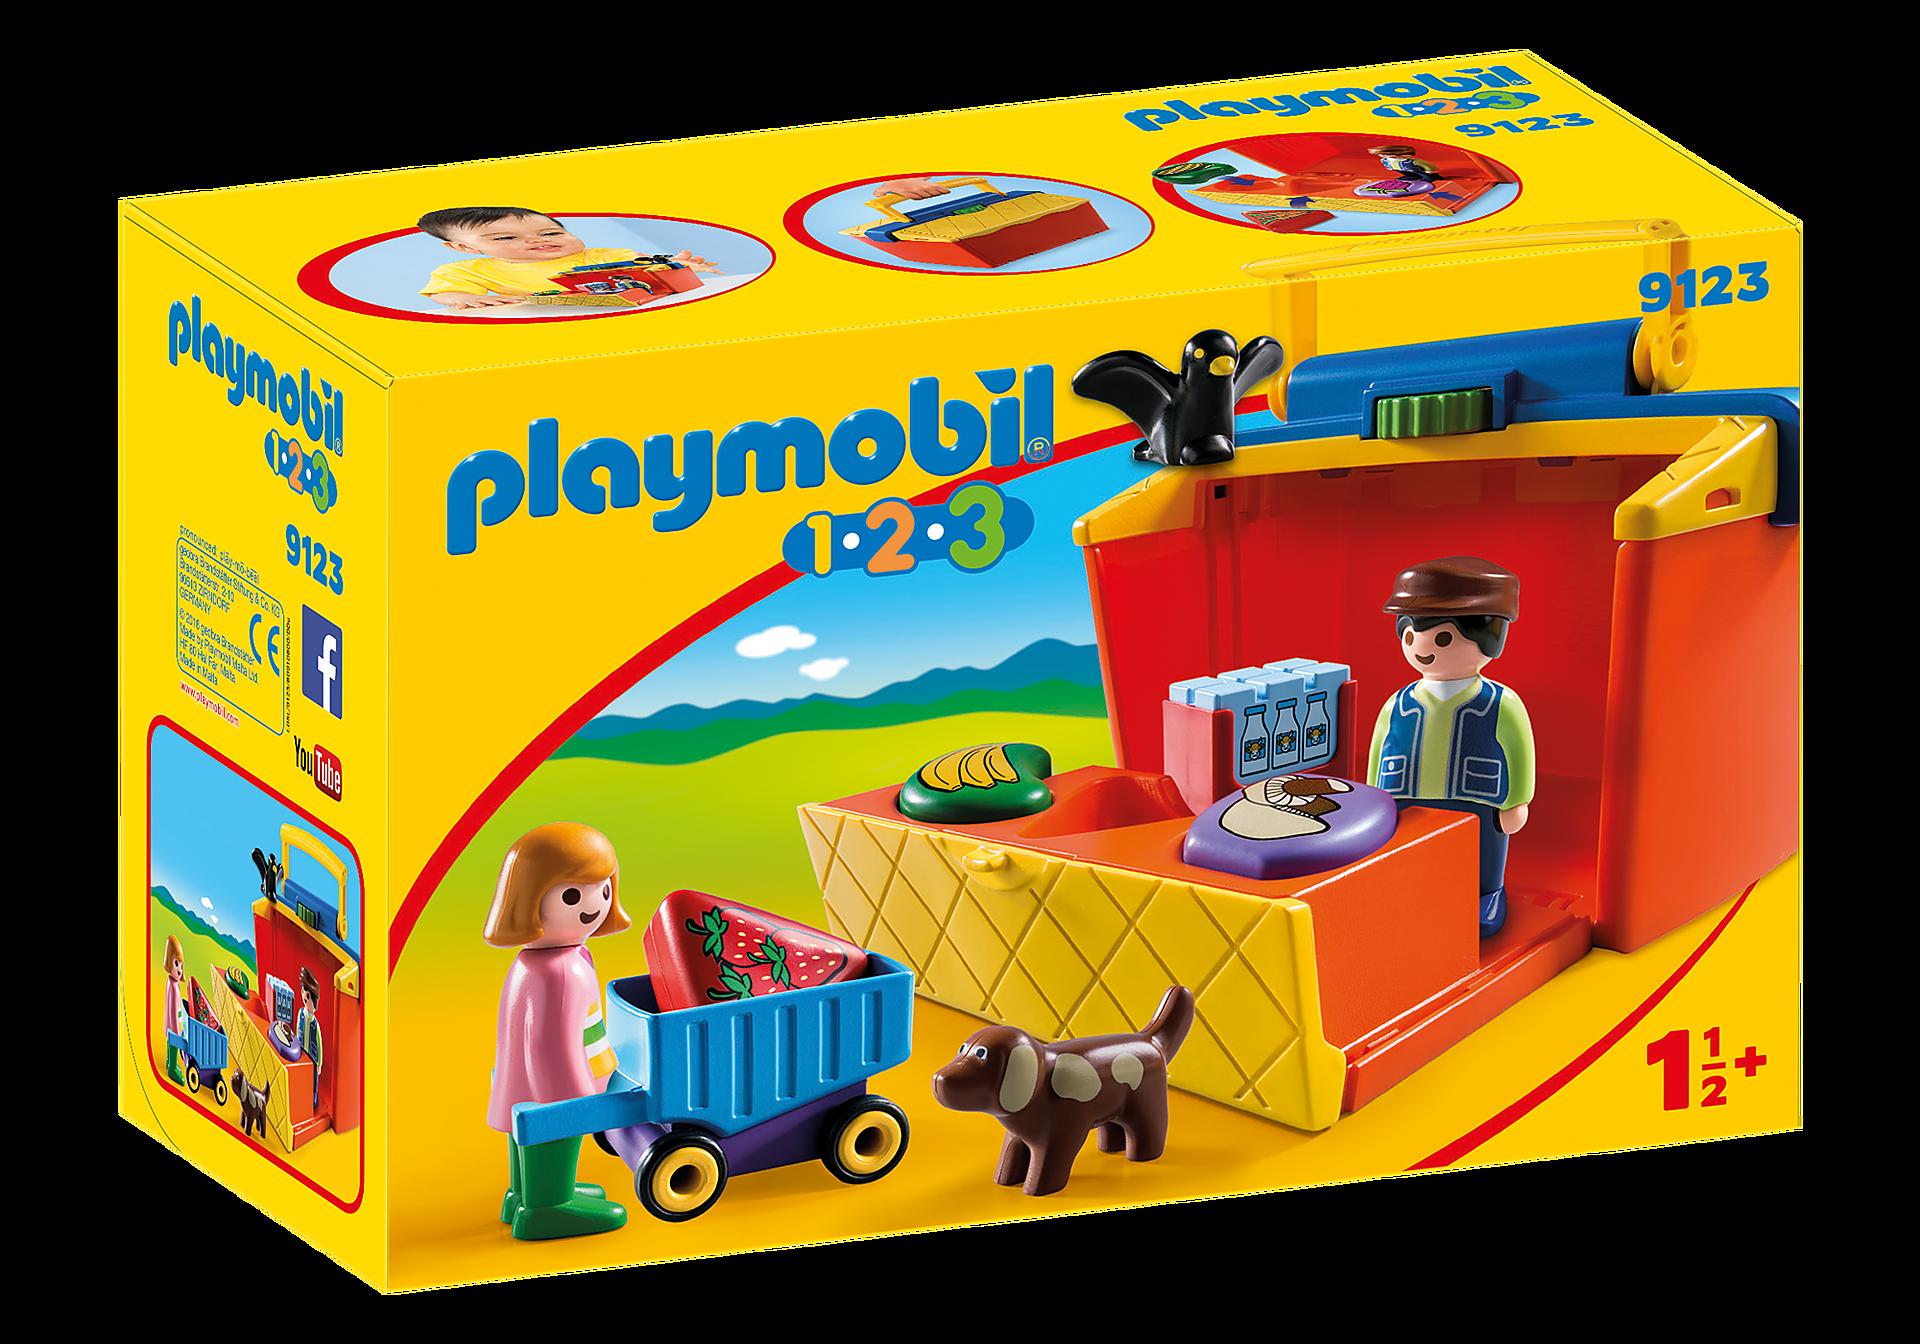 http://media.playmobil.com/i/playmobil/9123_product_box_front/1.2.3 Mercado Maletín